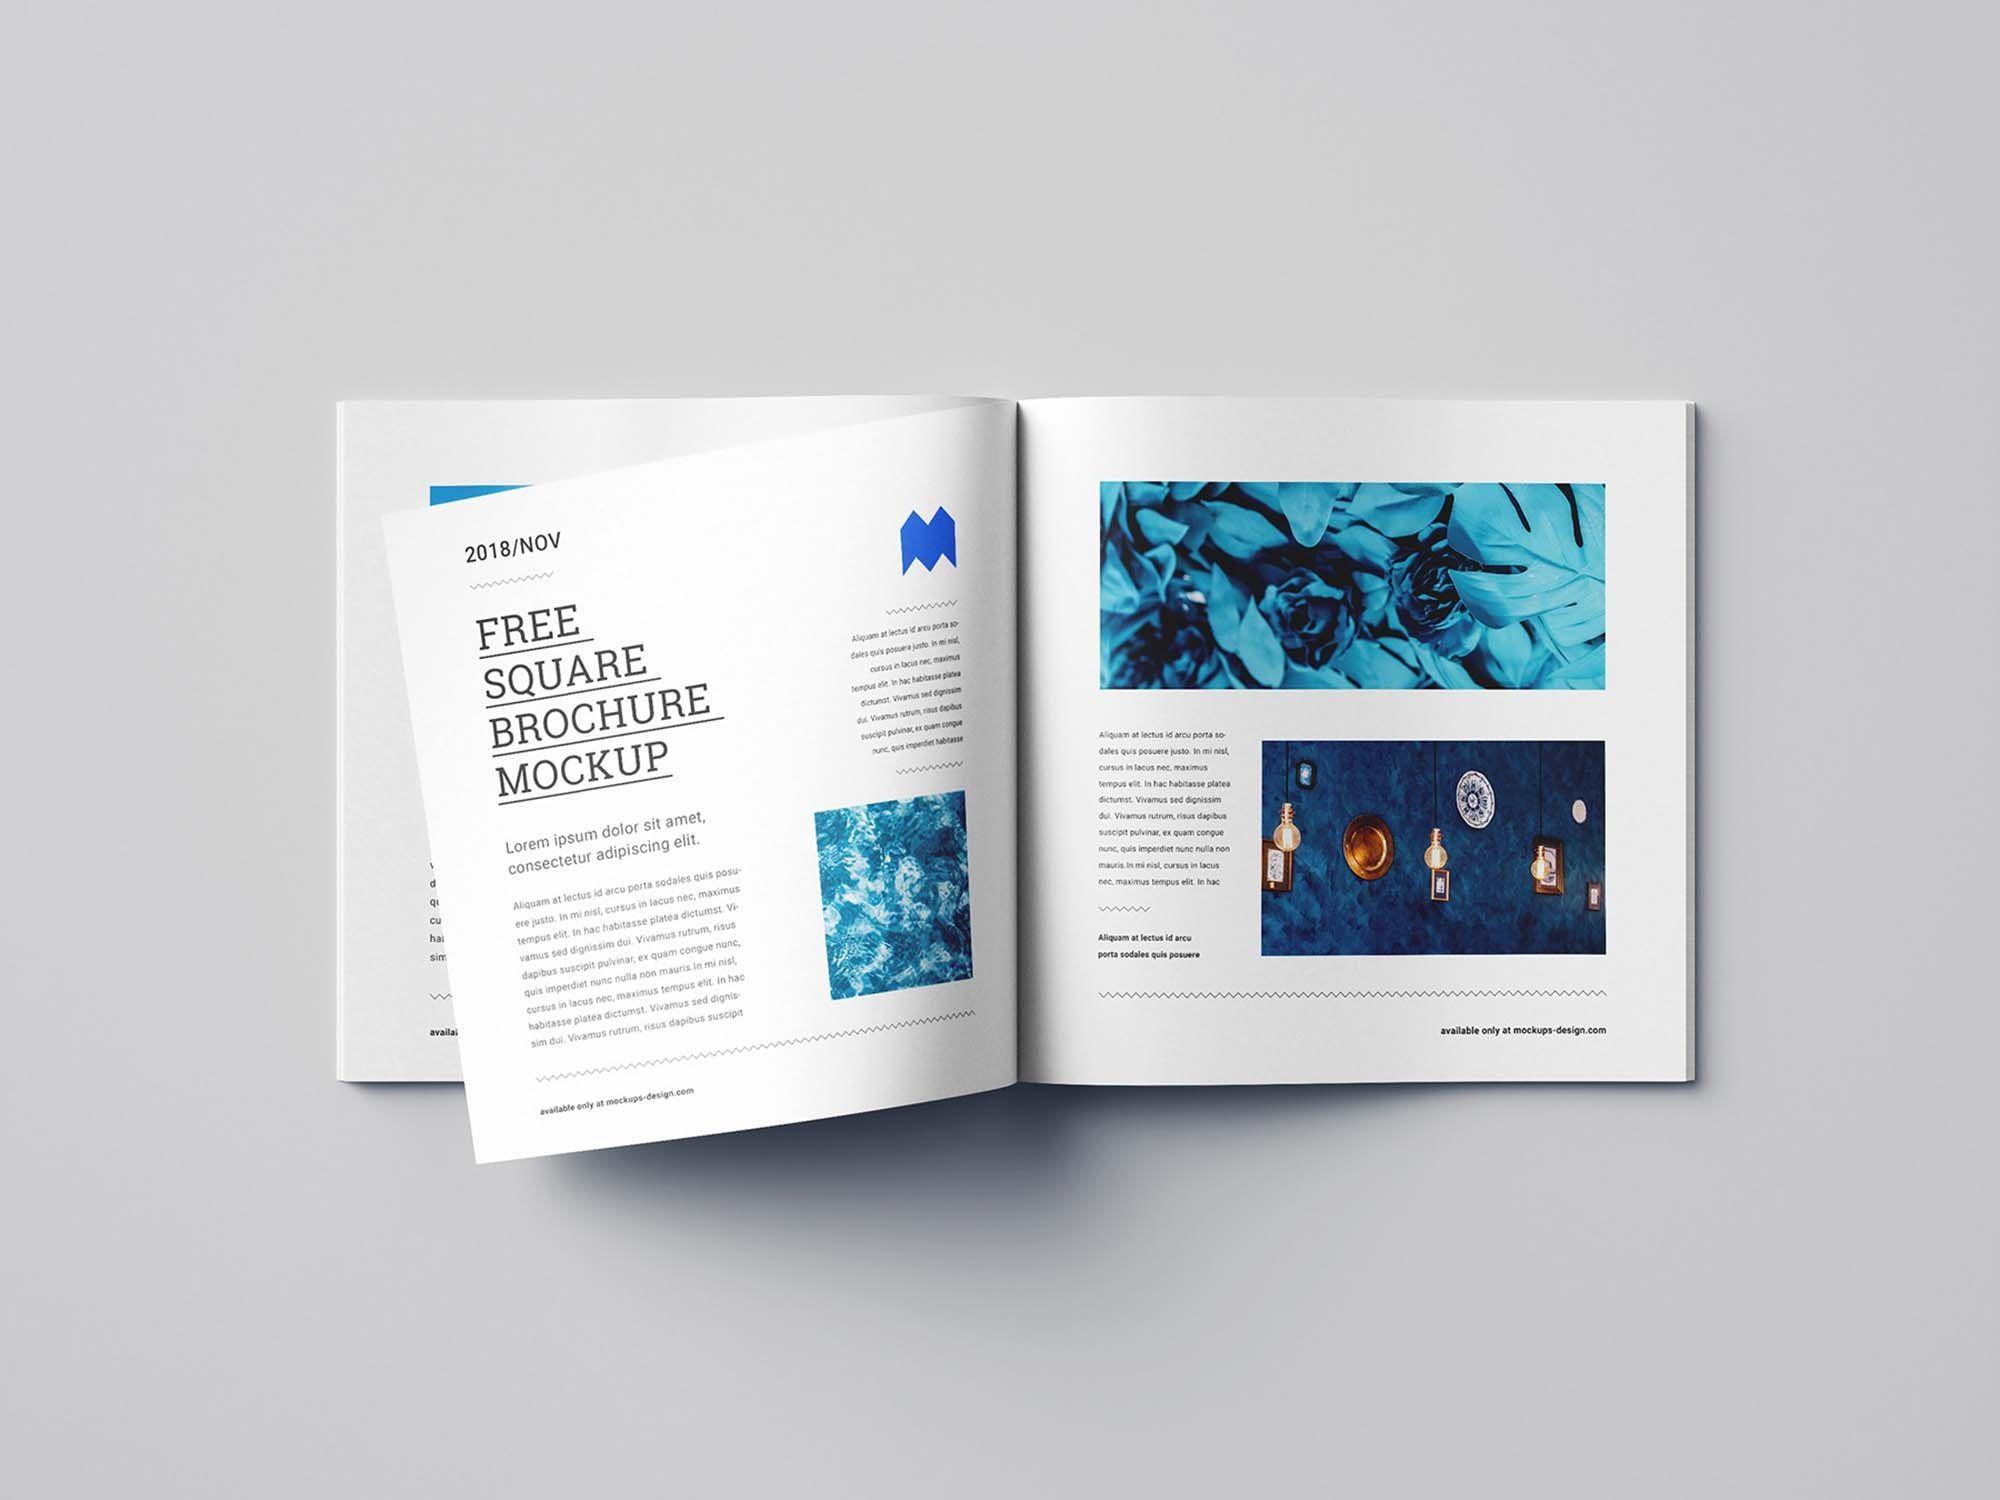 007 Fantastic Square Brochure Template Psd Free Download Idea Full